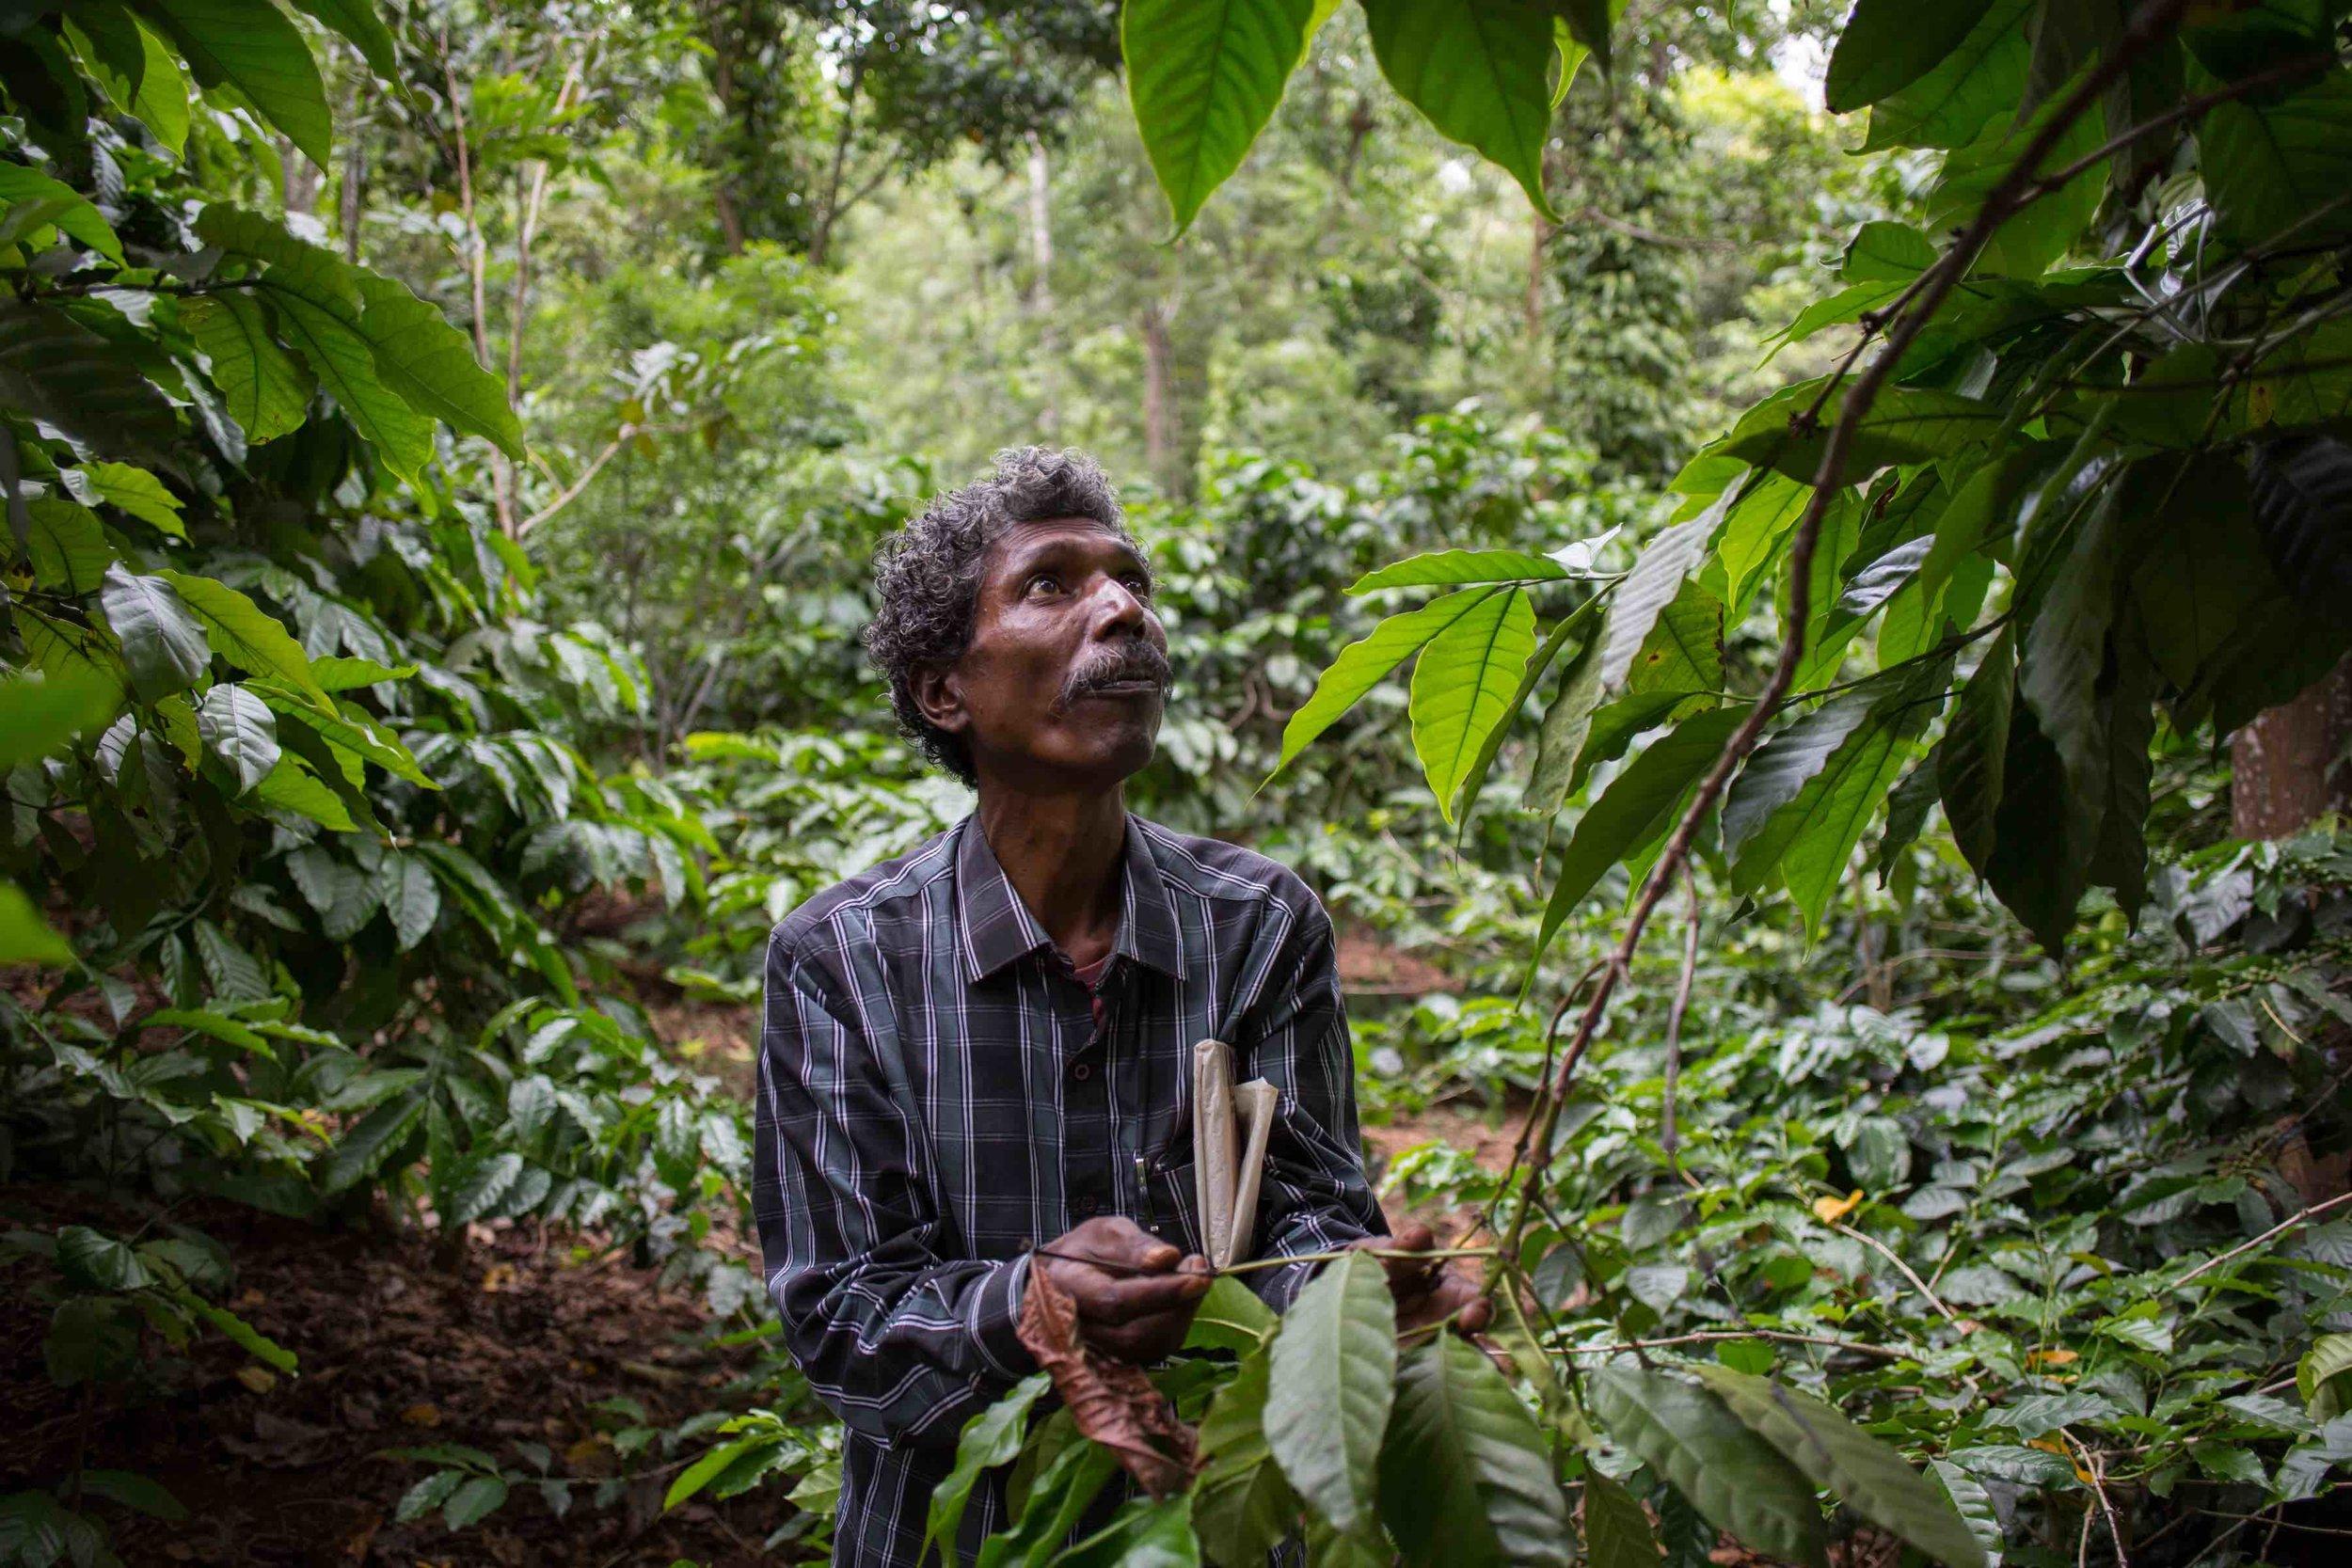 M. Sannarangegowda on a coffee farm in Biligiriranganatha Swamy Temple Wildlife Sanctuary  Image credit: Vivek M